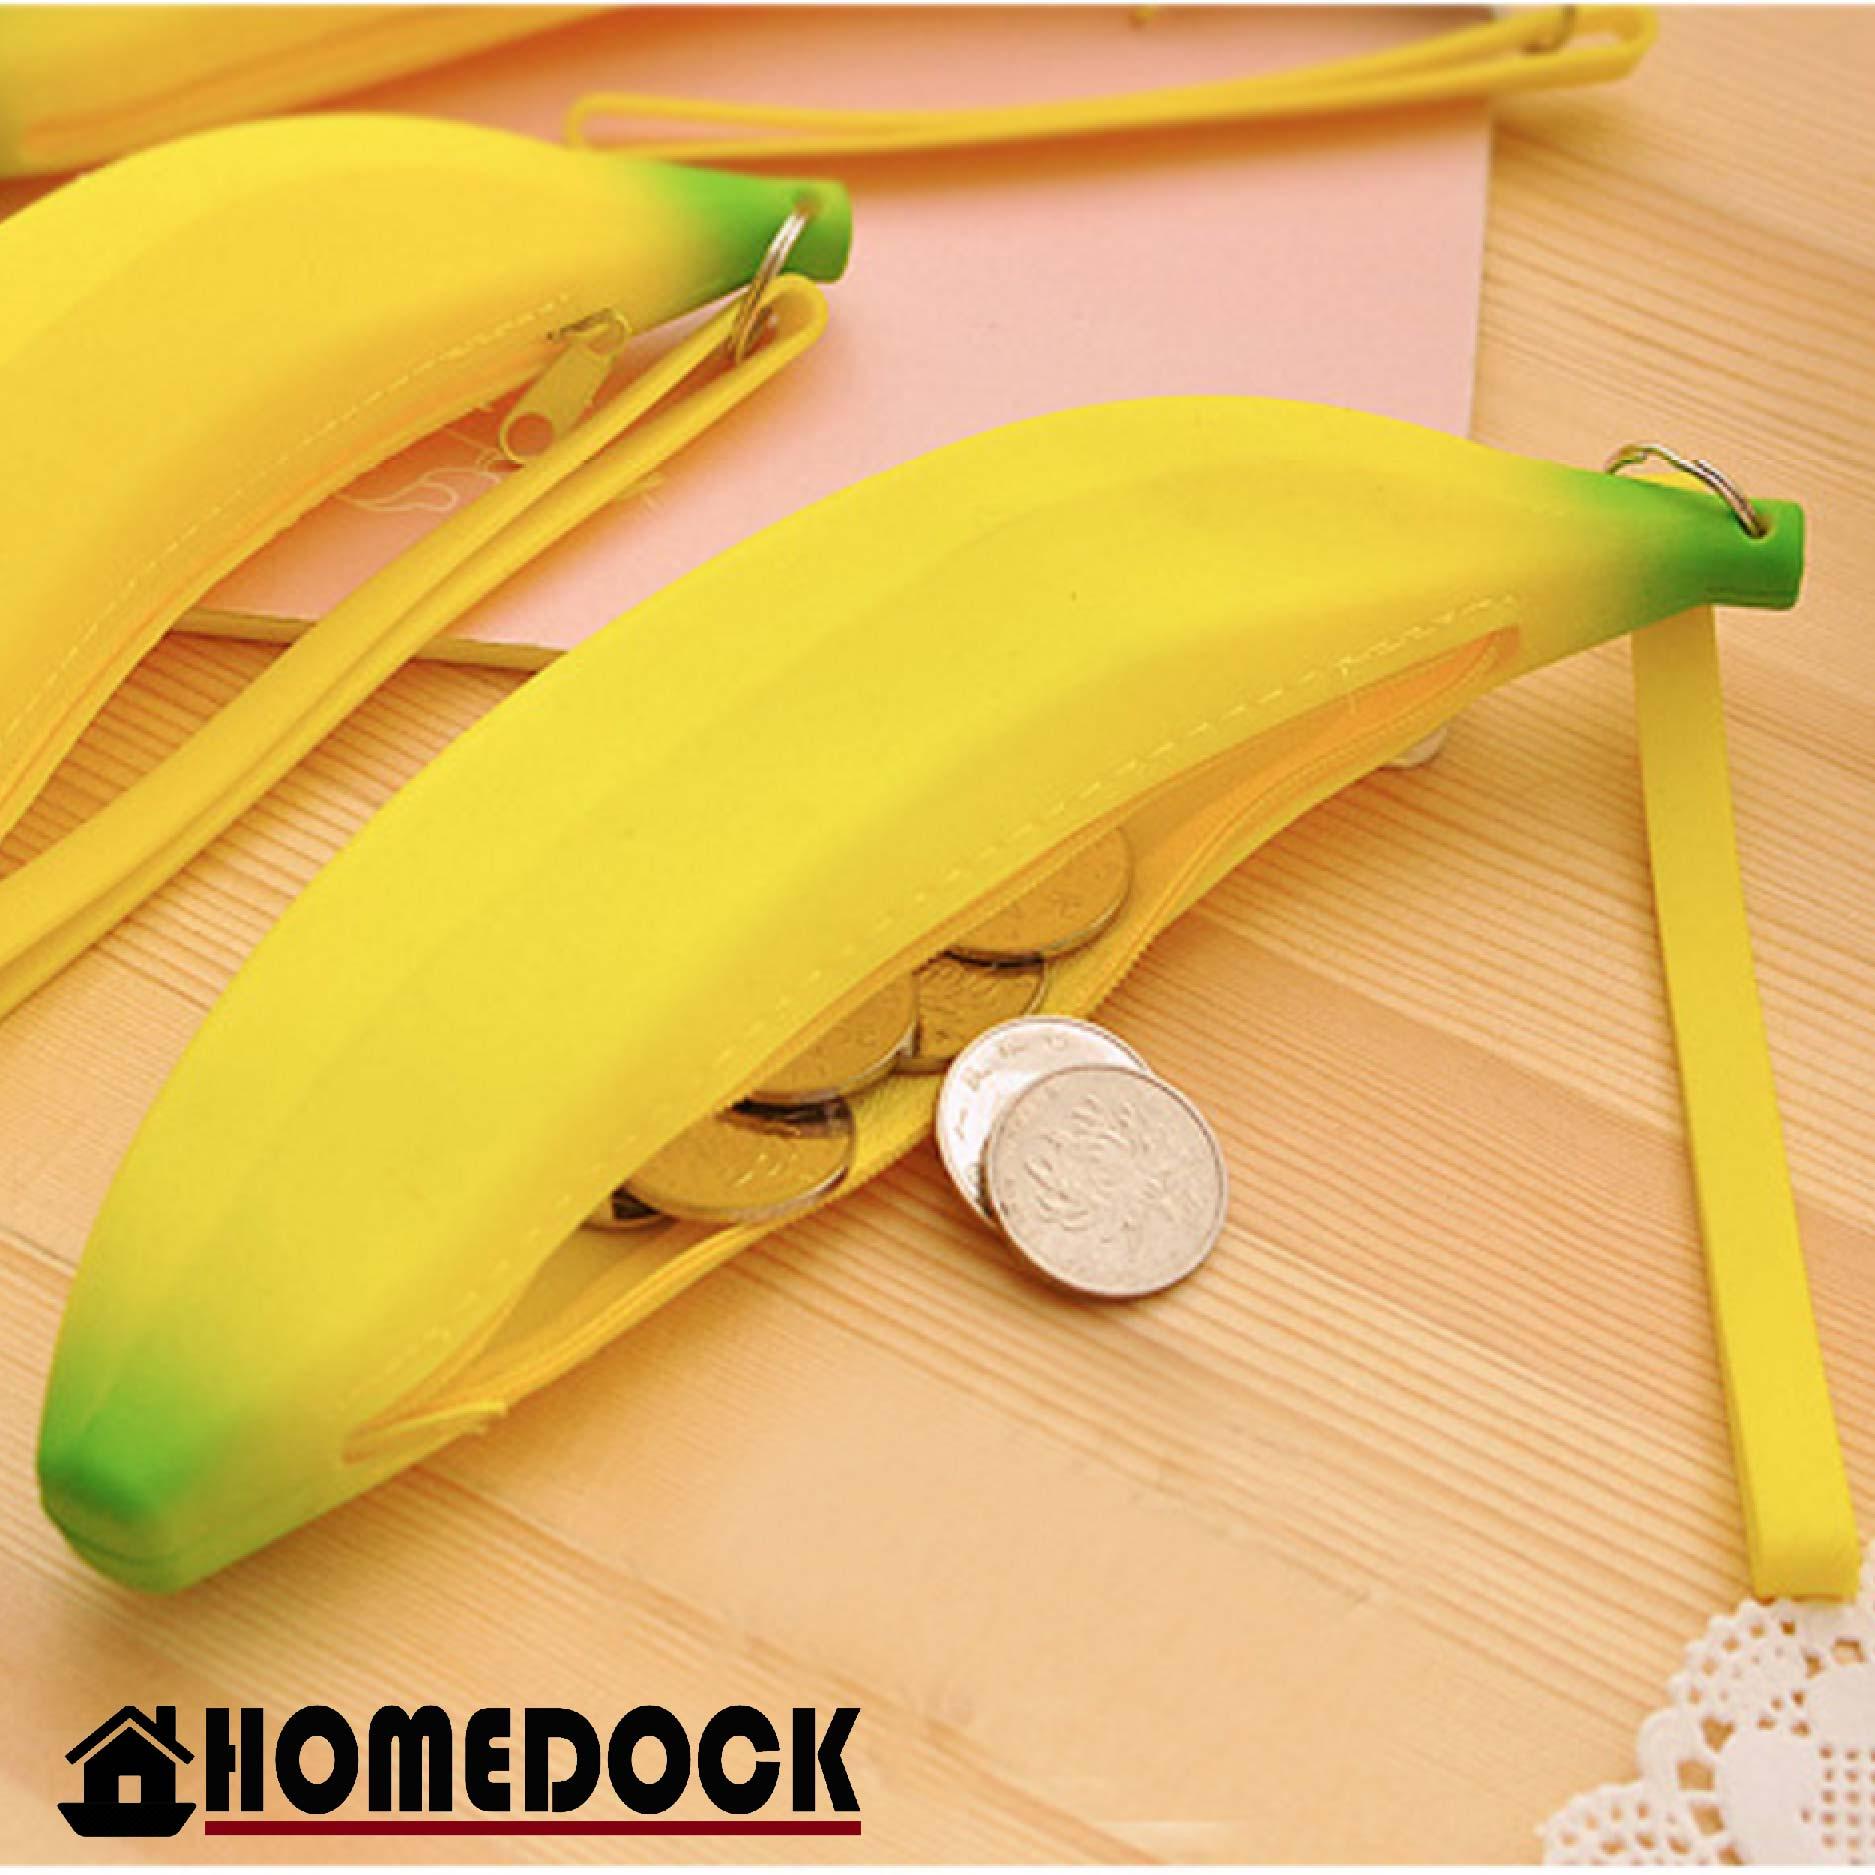 HOMEDOCK-可愛香蕉零錢包(矽膠) 錢包/小包/隨身包/皮夾/zakka/銅板/硬幣